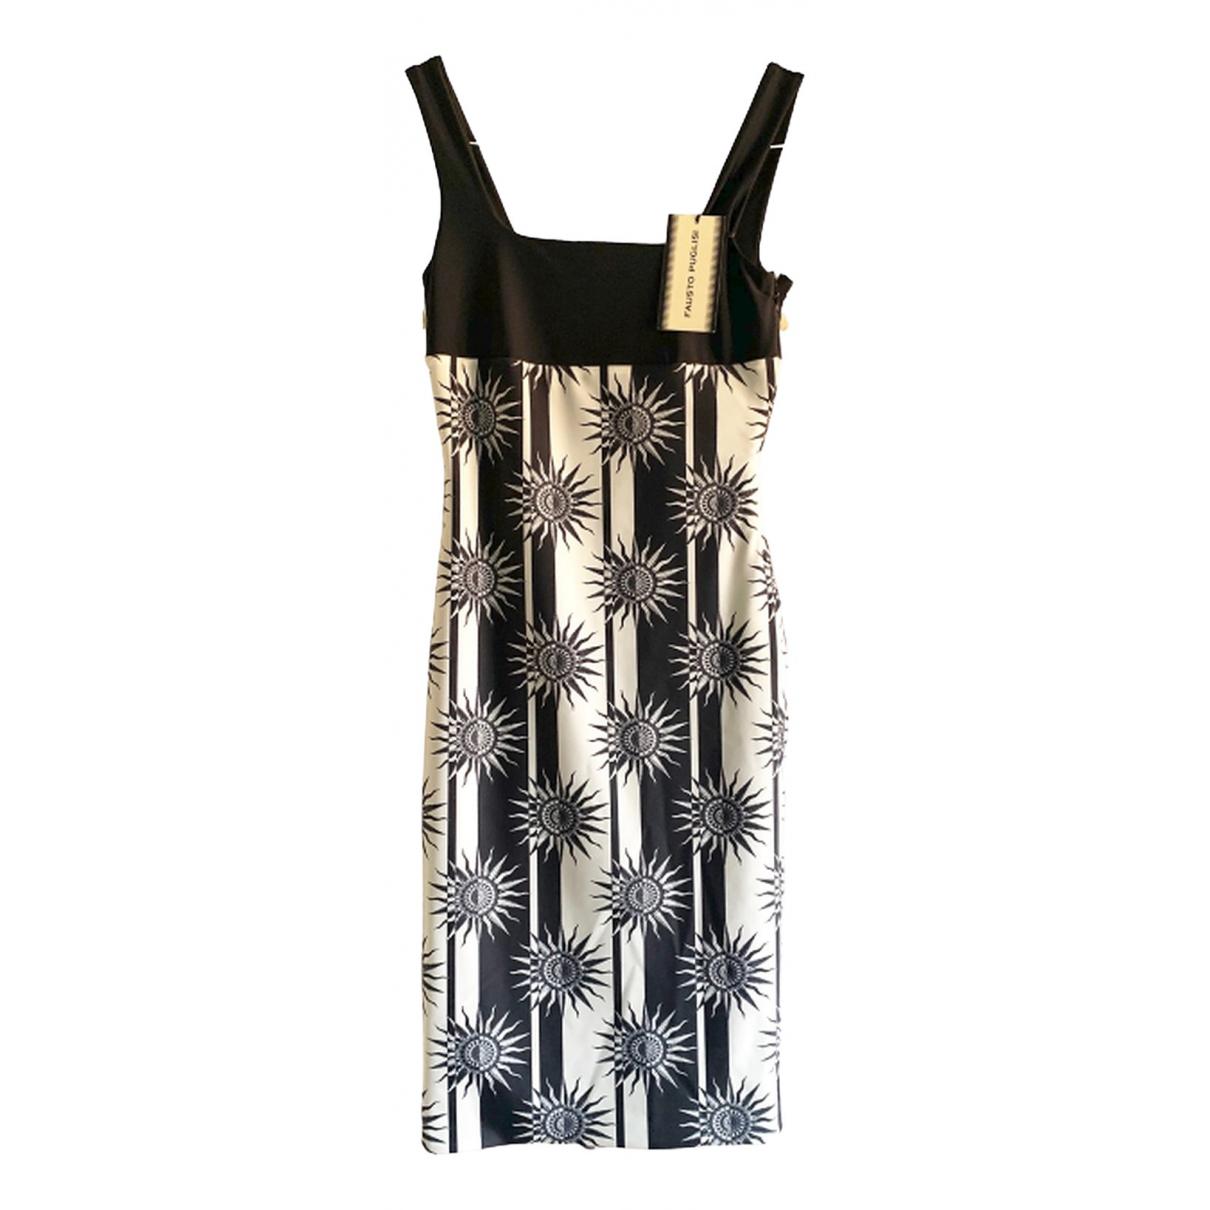 Fausto Puglisi \N Kleid in  Schwarz Polyester